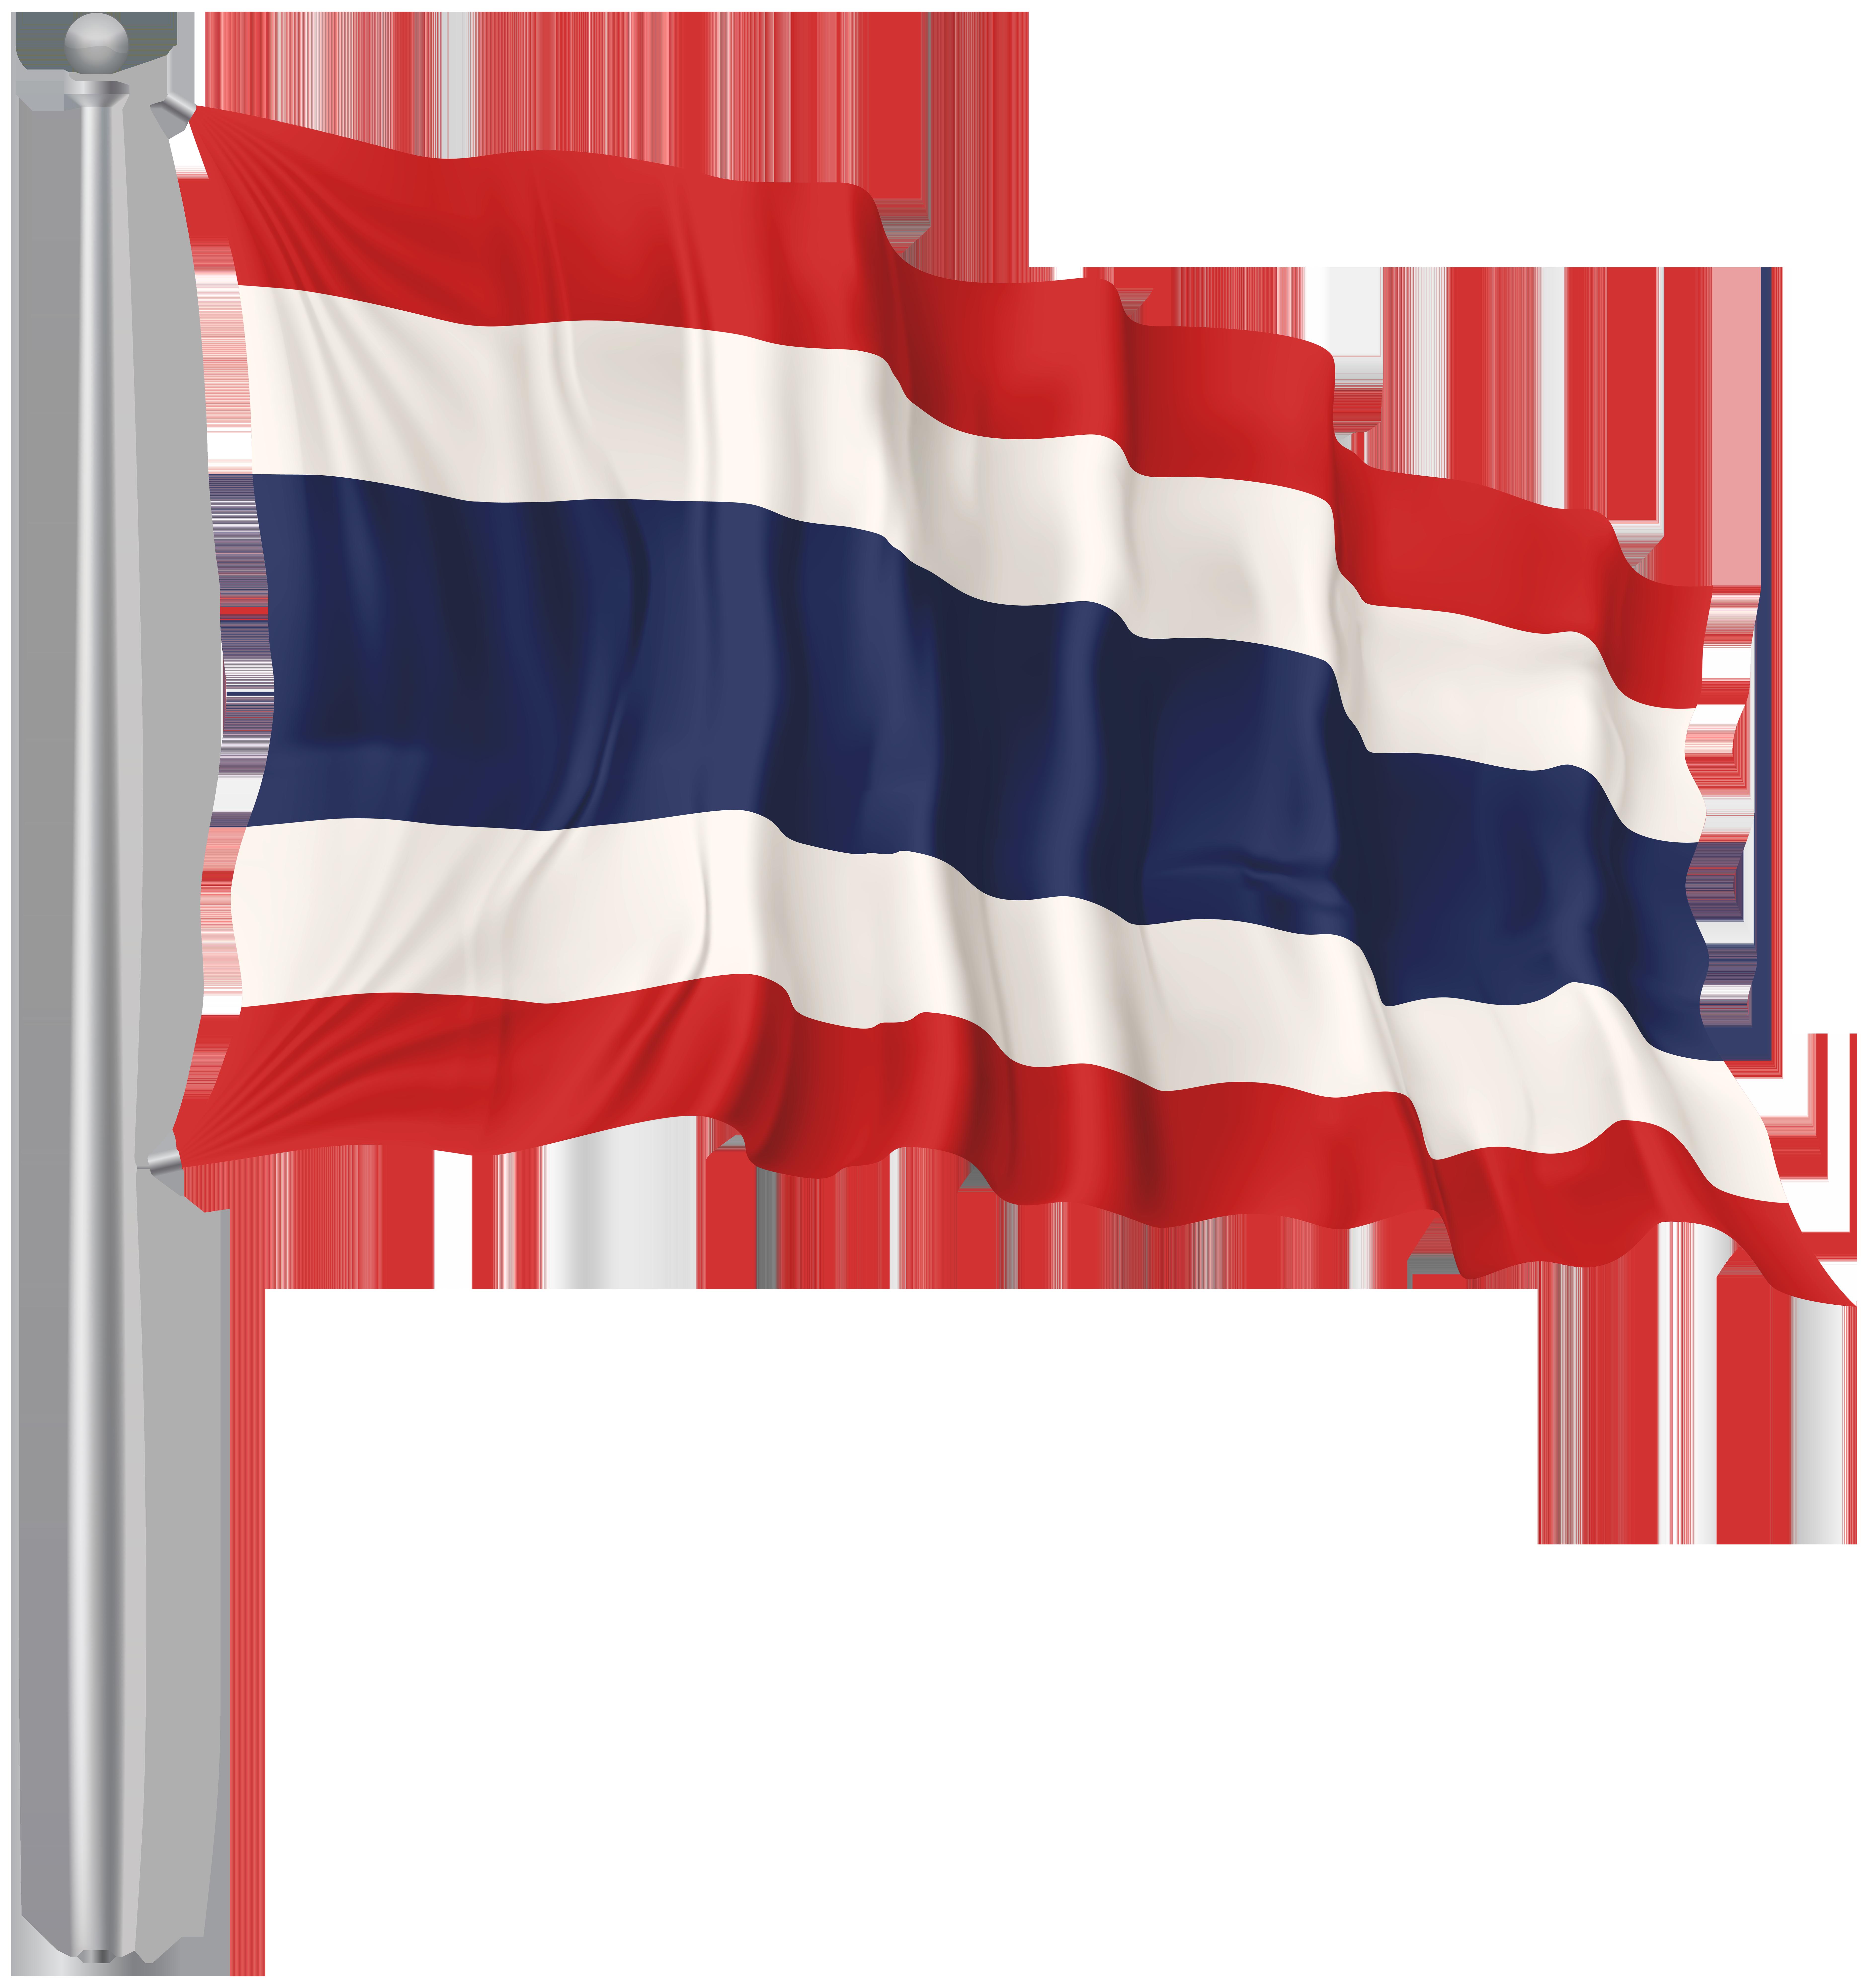 Thailand Waving Flag PNG Image.